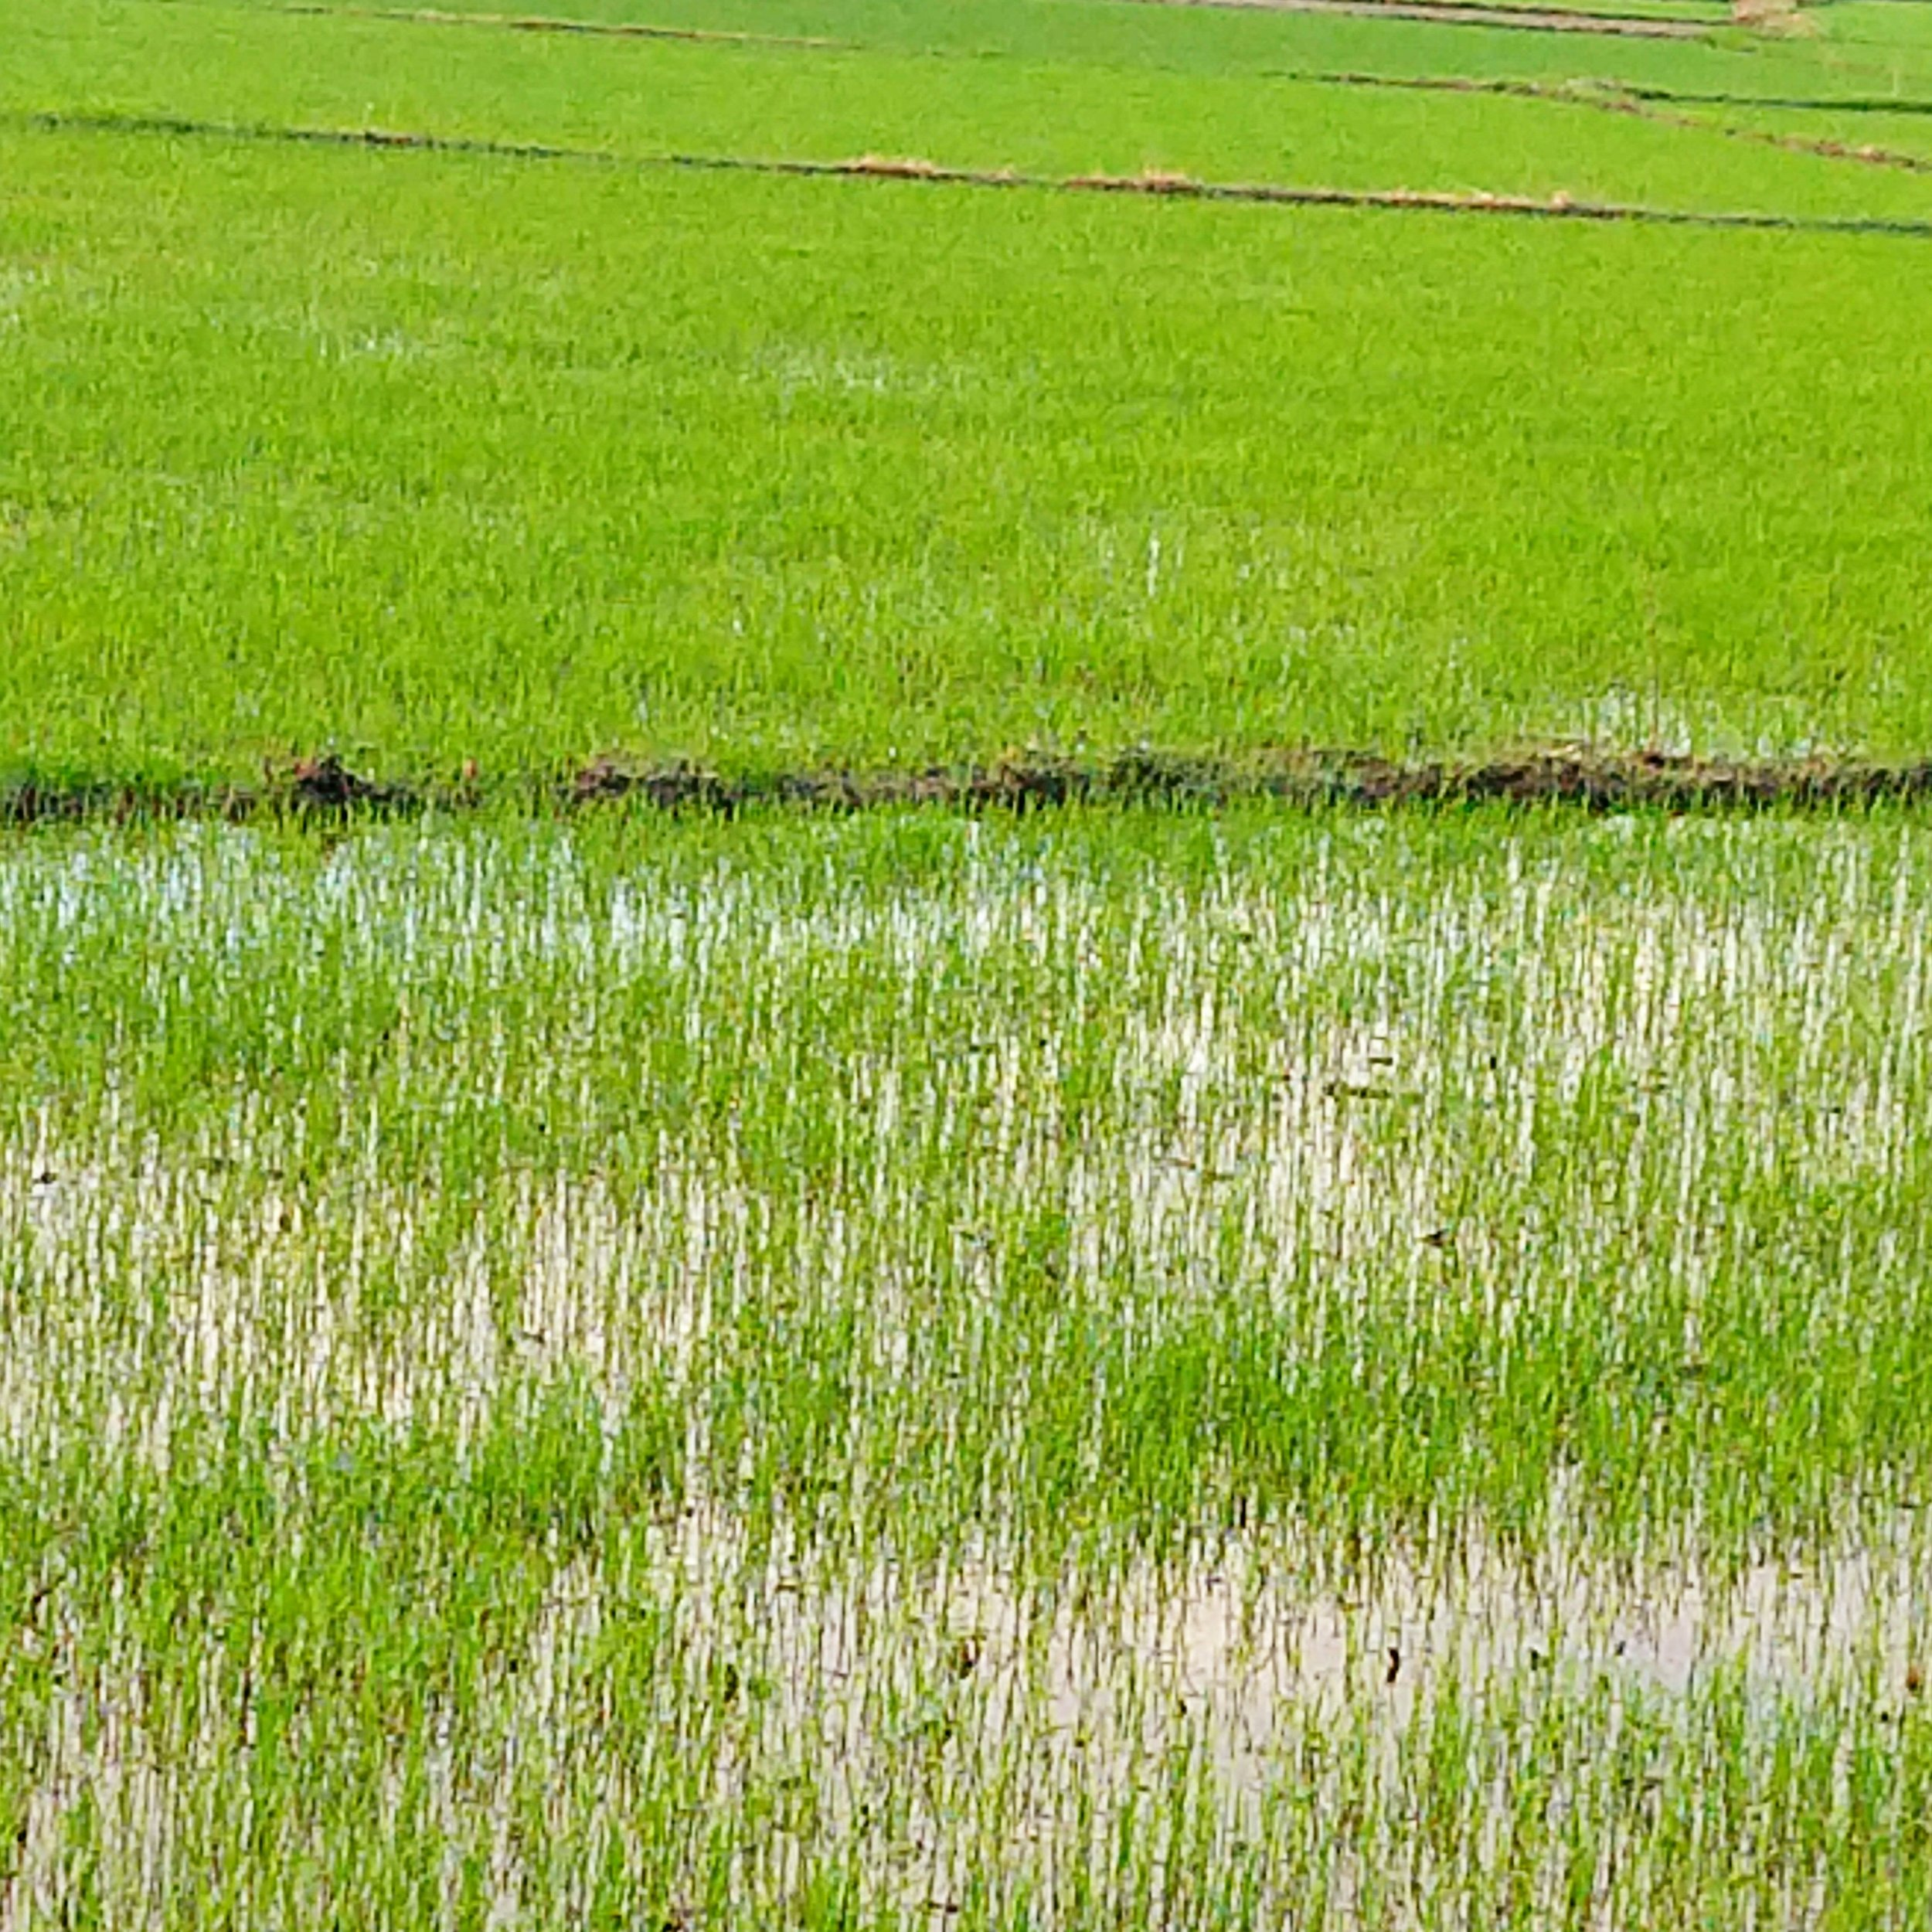 hoianricefieldplanted.jpg